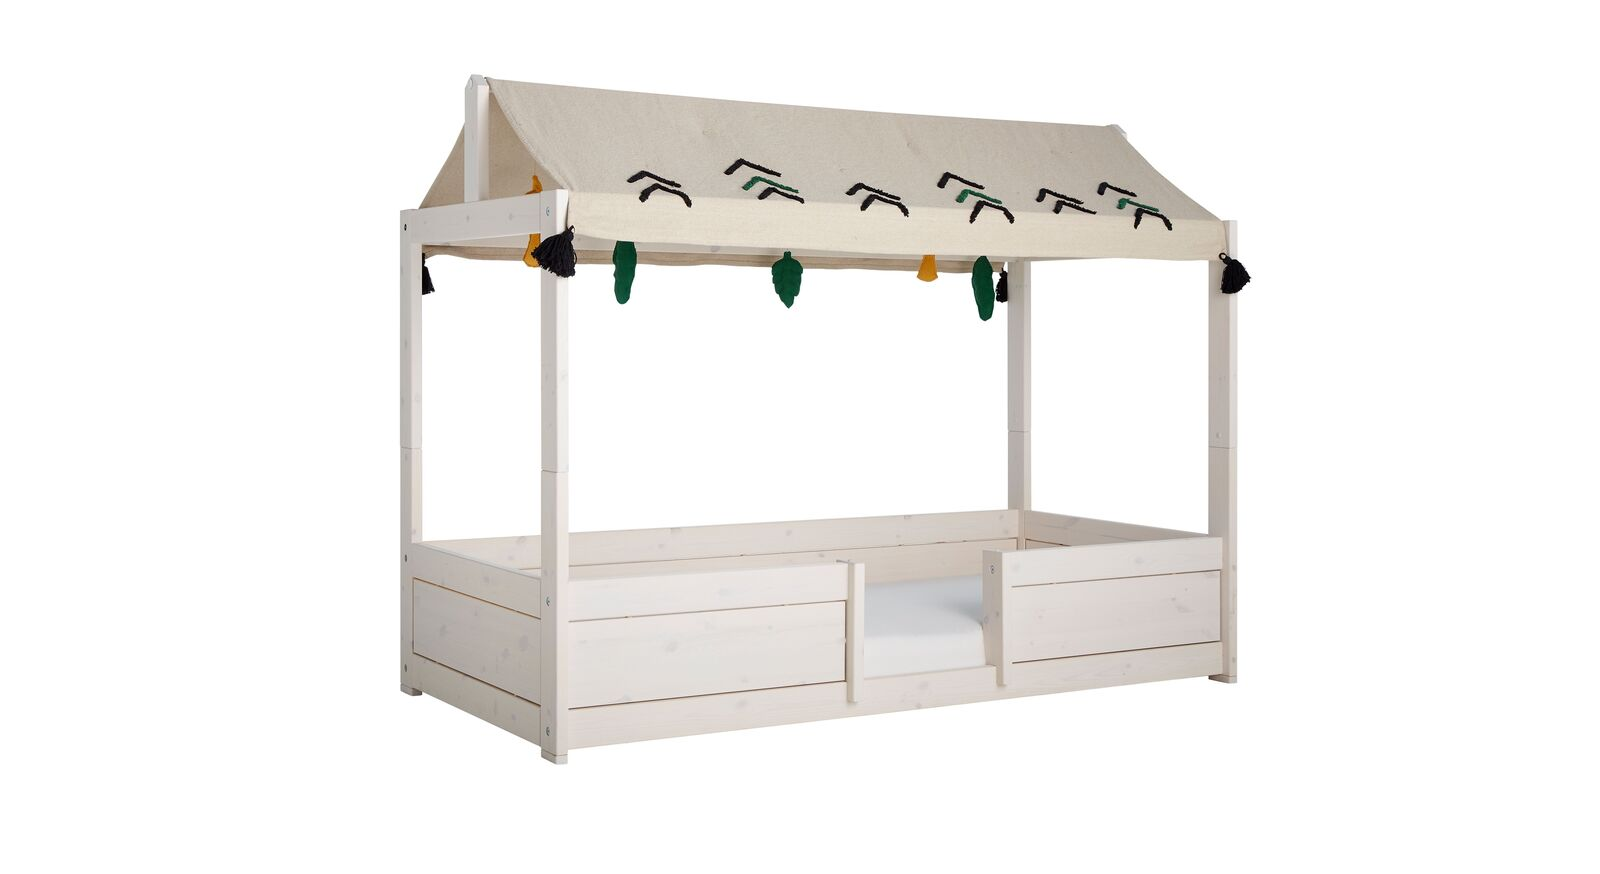 LIFETIME Kinderbett 4-in-1 Wild Life aus hellem Holz